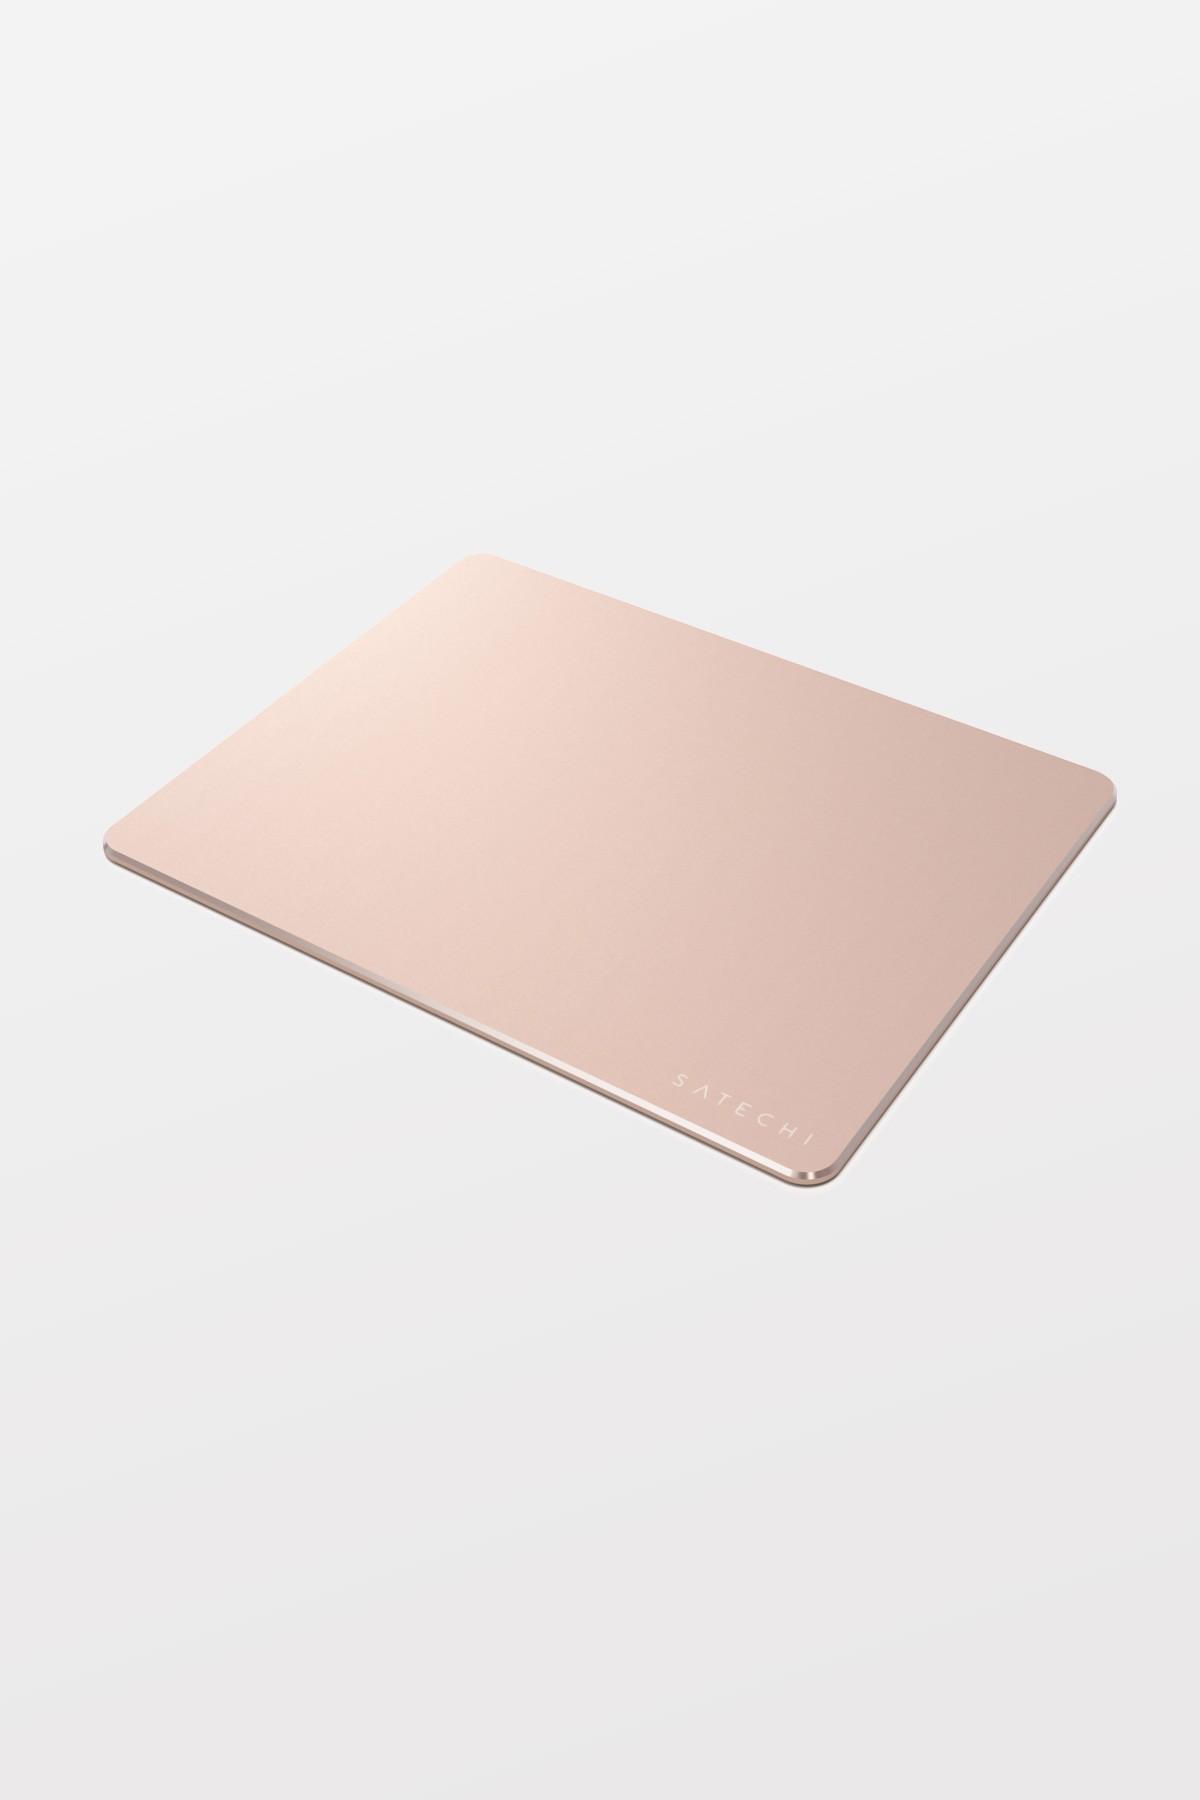 SATECHI Aluminium Mouse Pad - Rose Gold